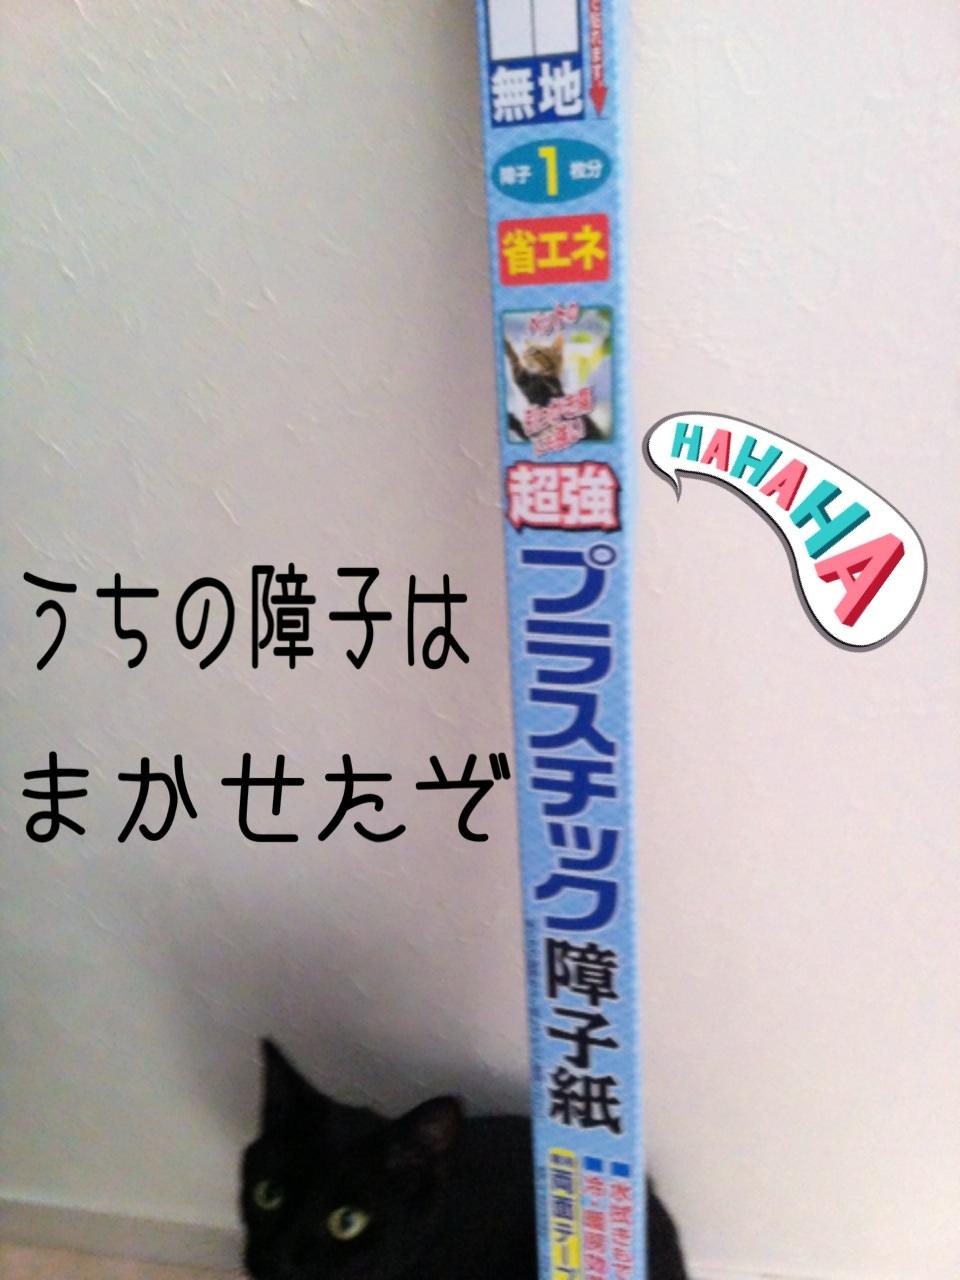 image_20130718193339.jpg